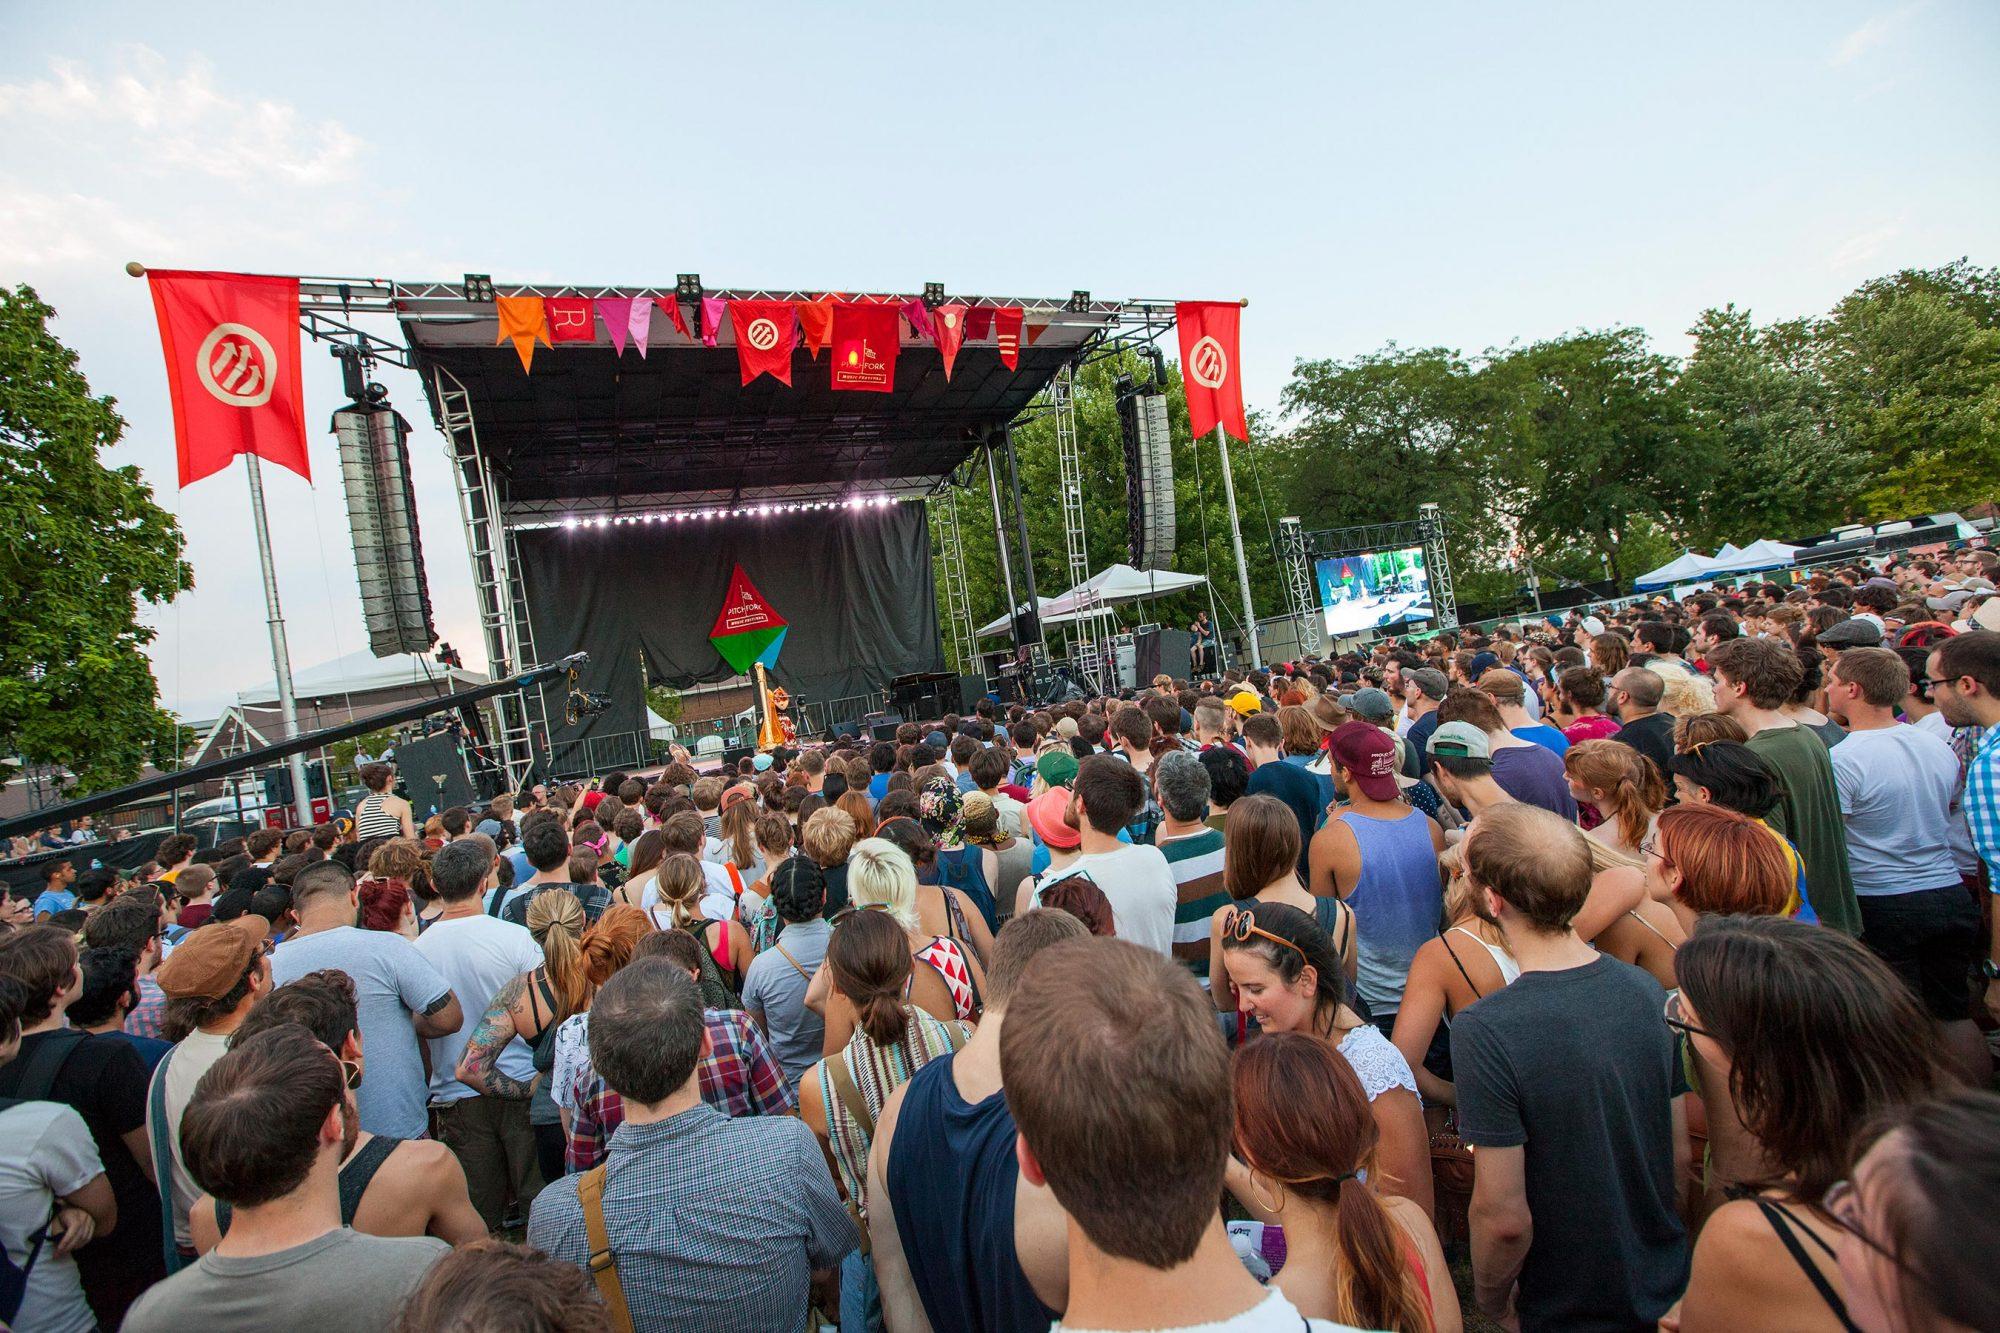 2013 Pitchfork Music Festival - Day 1